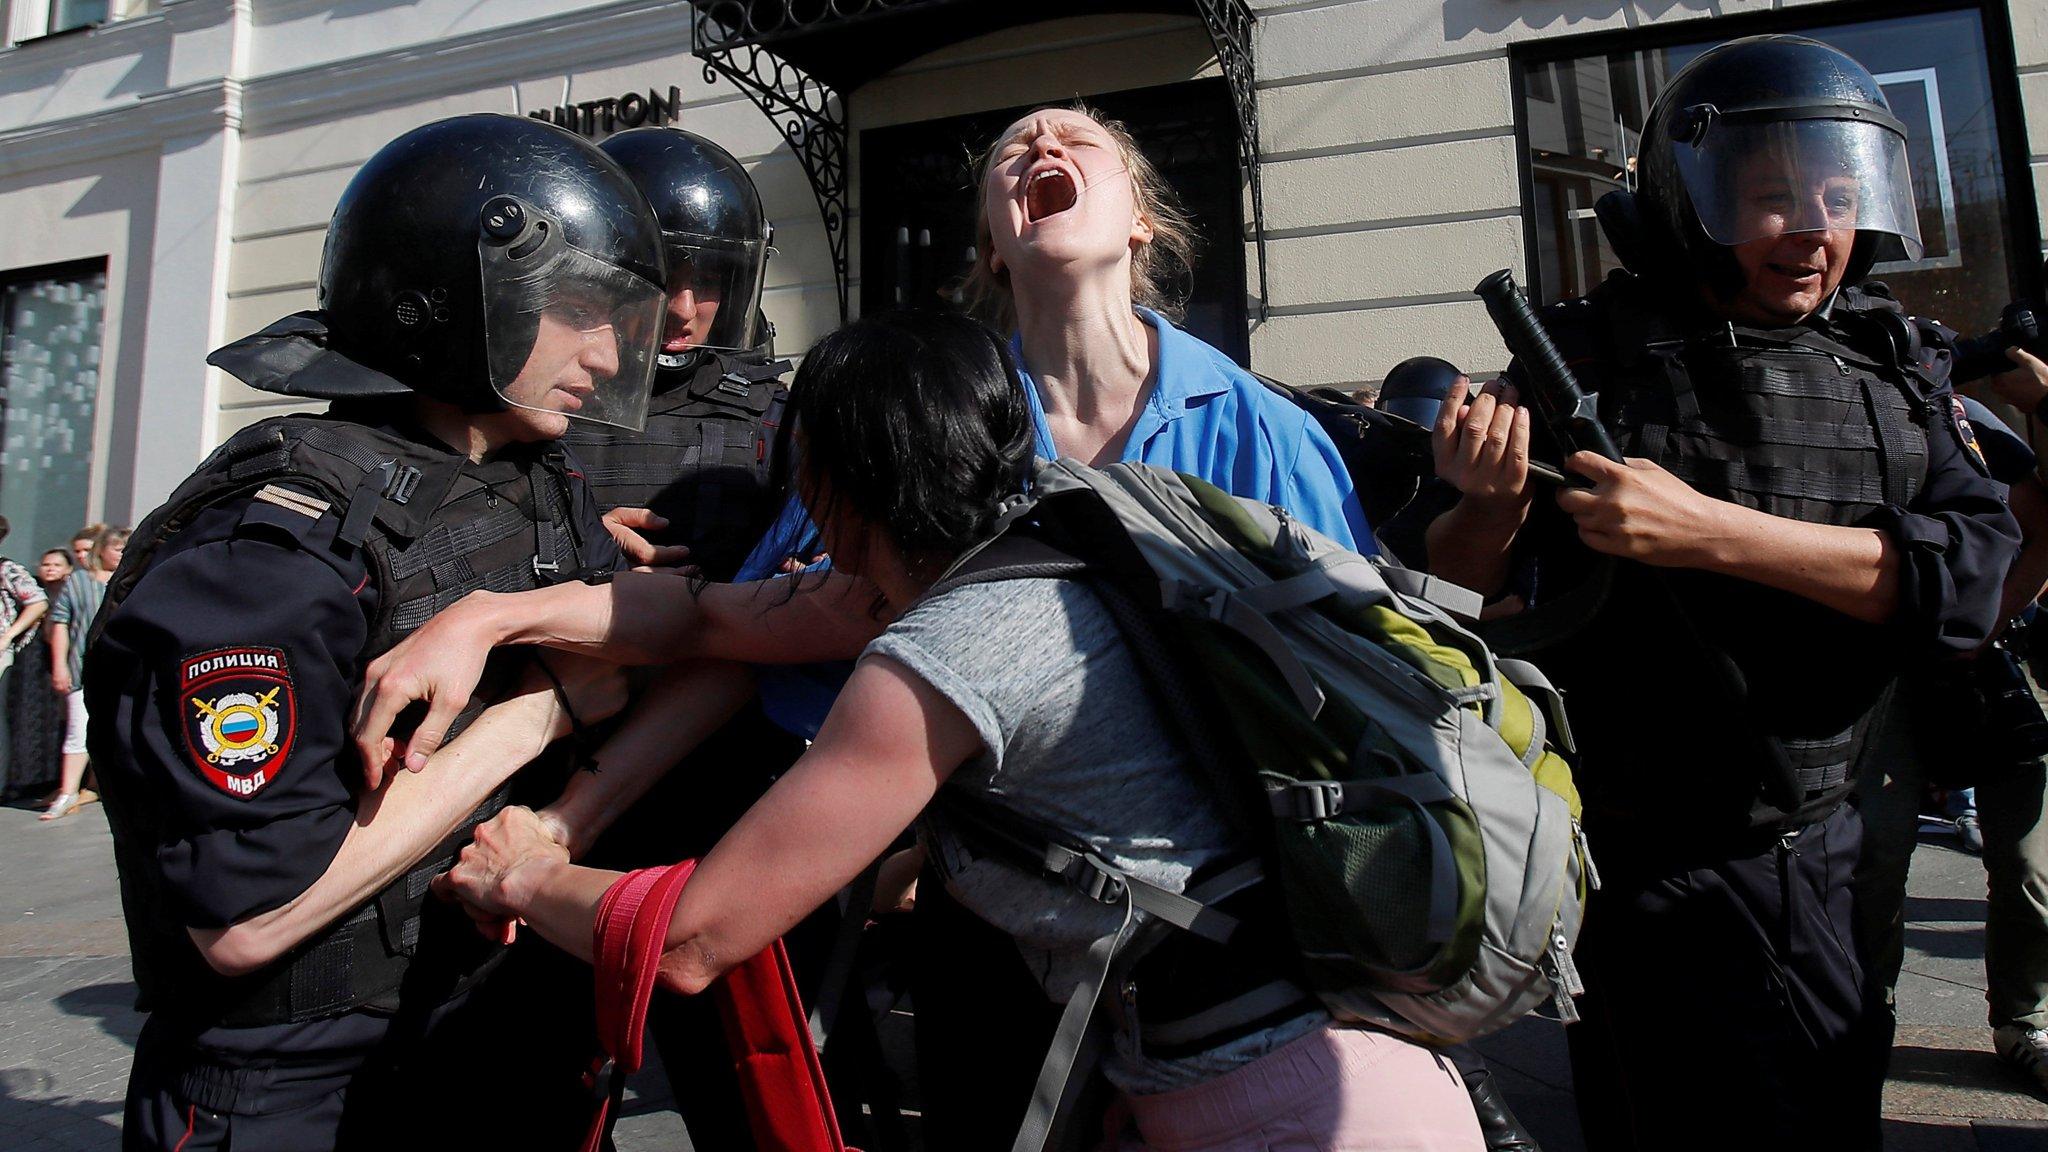 Russians feel the pain of Vladimir Putin's regime